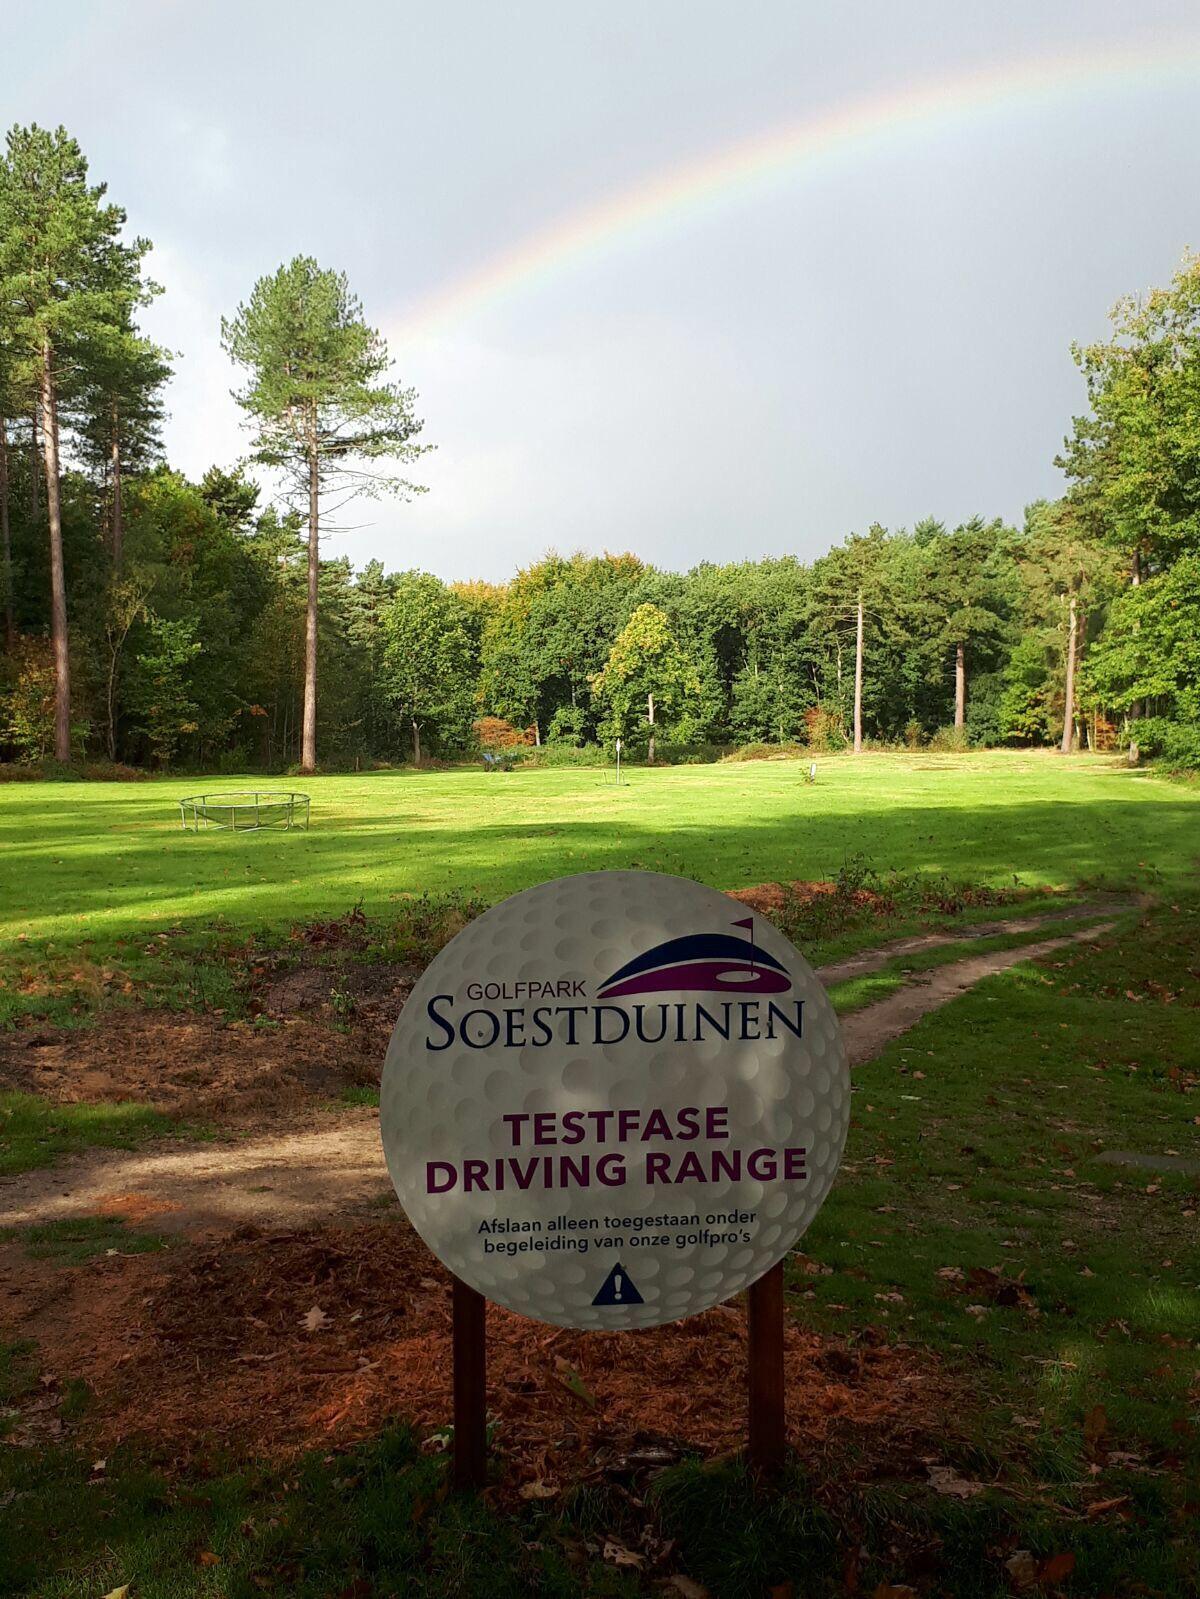 Pin von Han Overkamp auf Golfpark Soestduinen | Pinterest